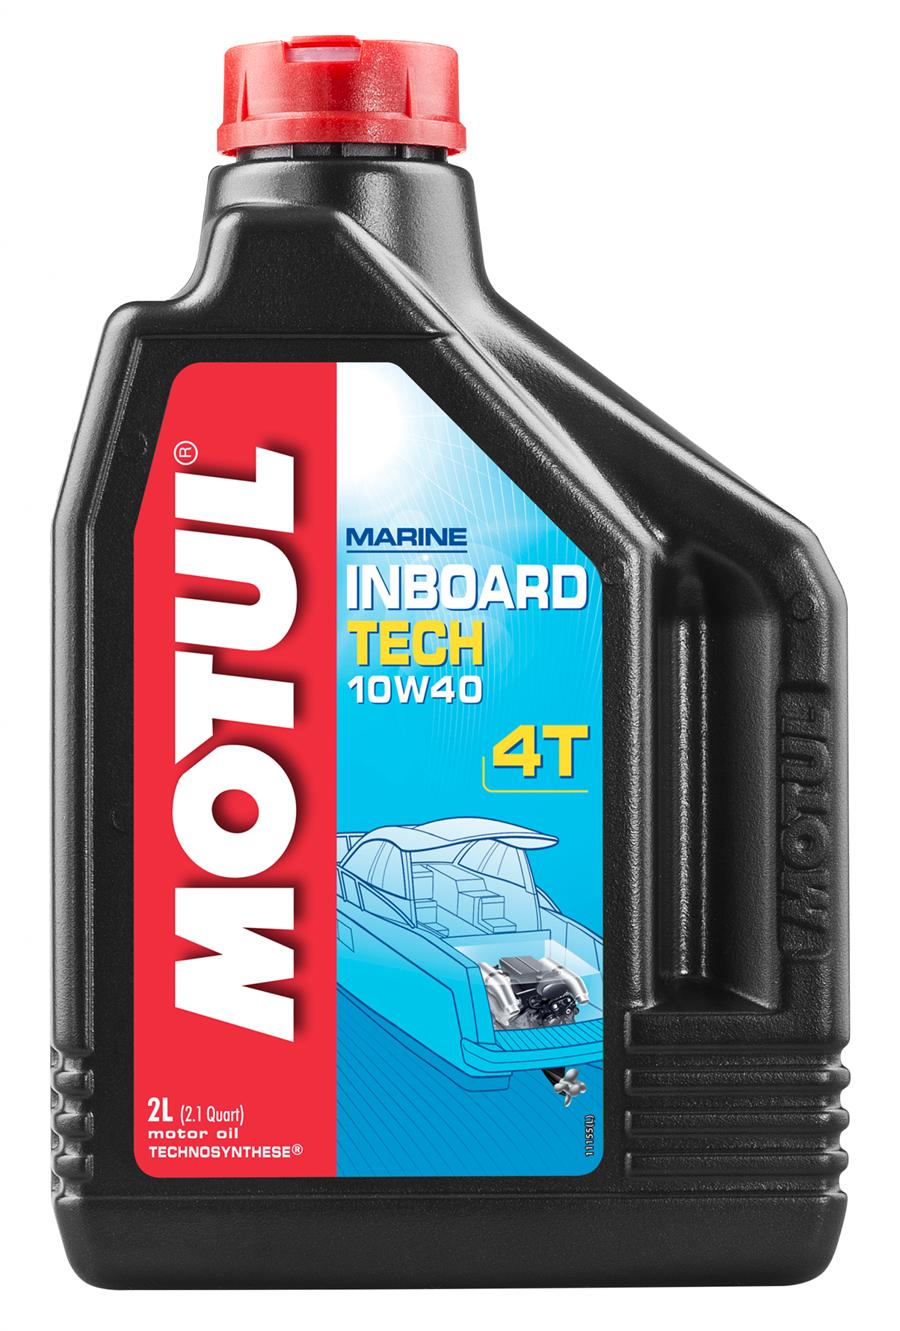 Motul Inboard Tech 4T 10W40 Масло для лодочных моторов